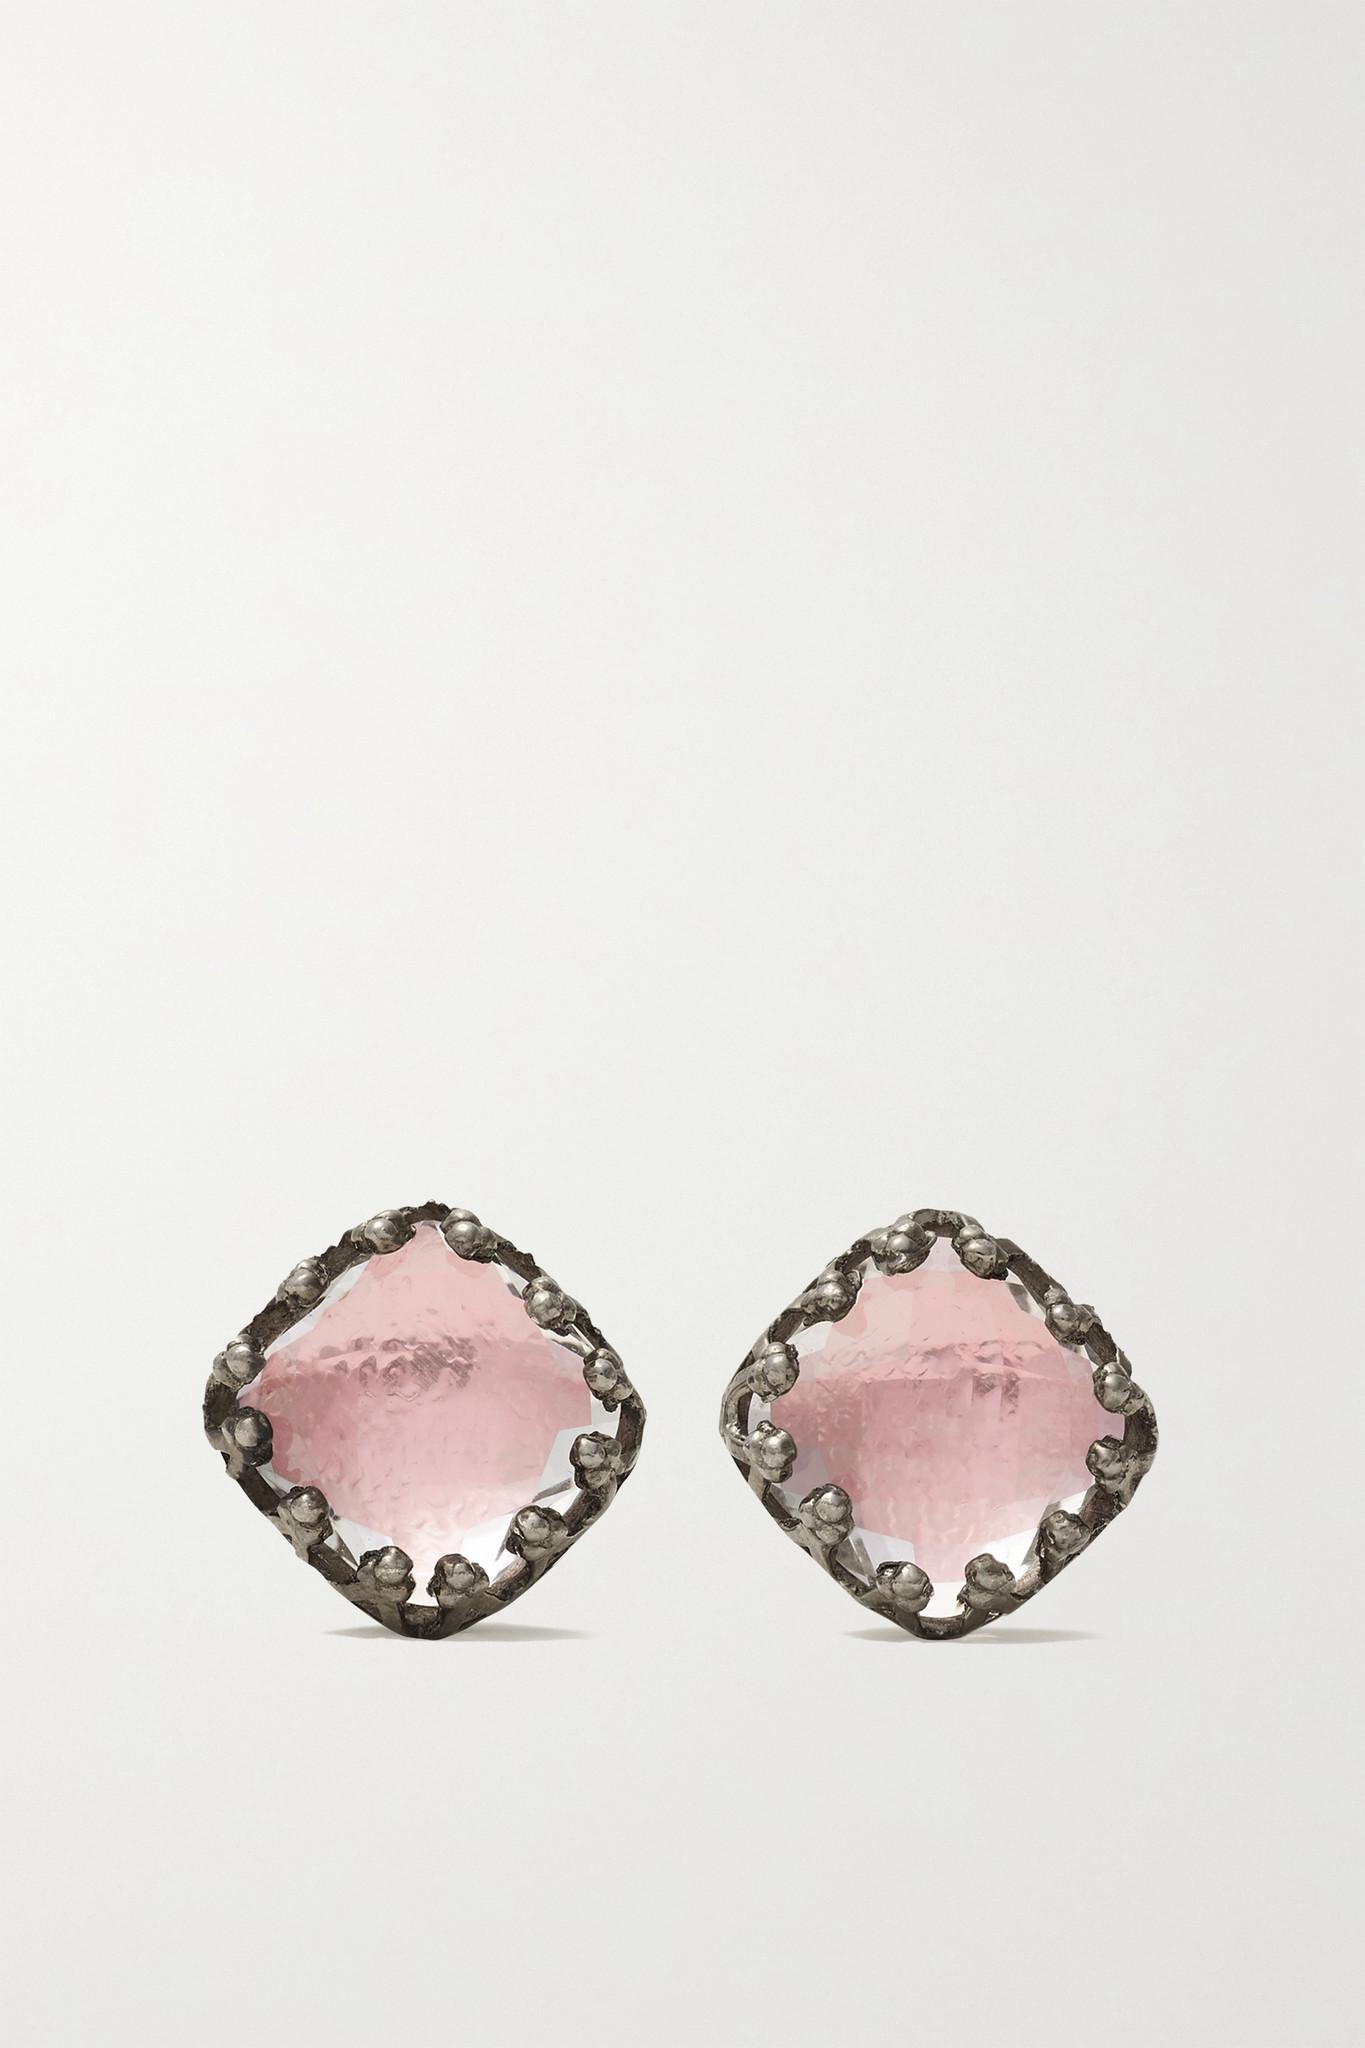 LARKSPUR & HAWK - Jane Rhodium-dipped Quartz Earrings - Silver - one size